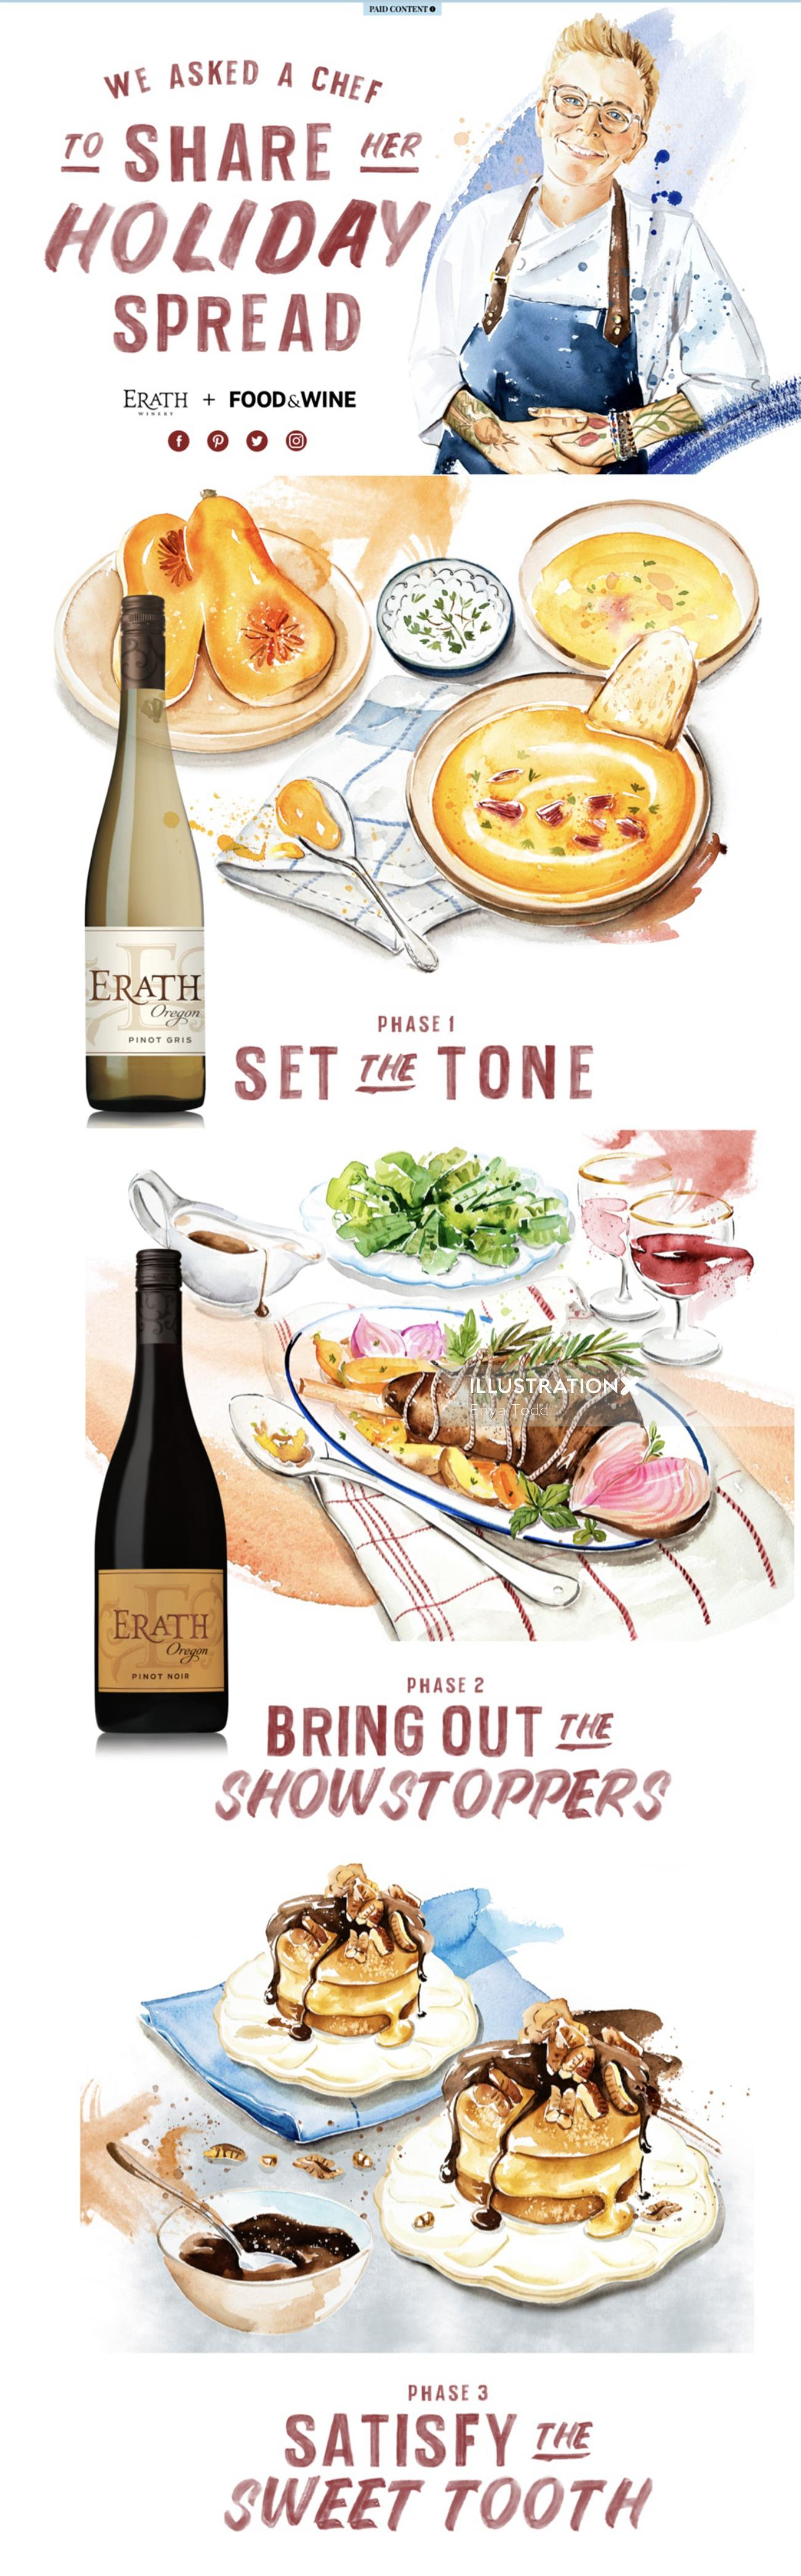 Erath Winery editorial